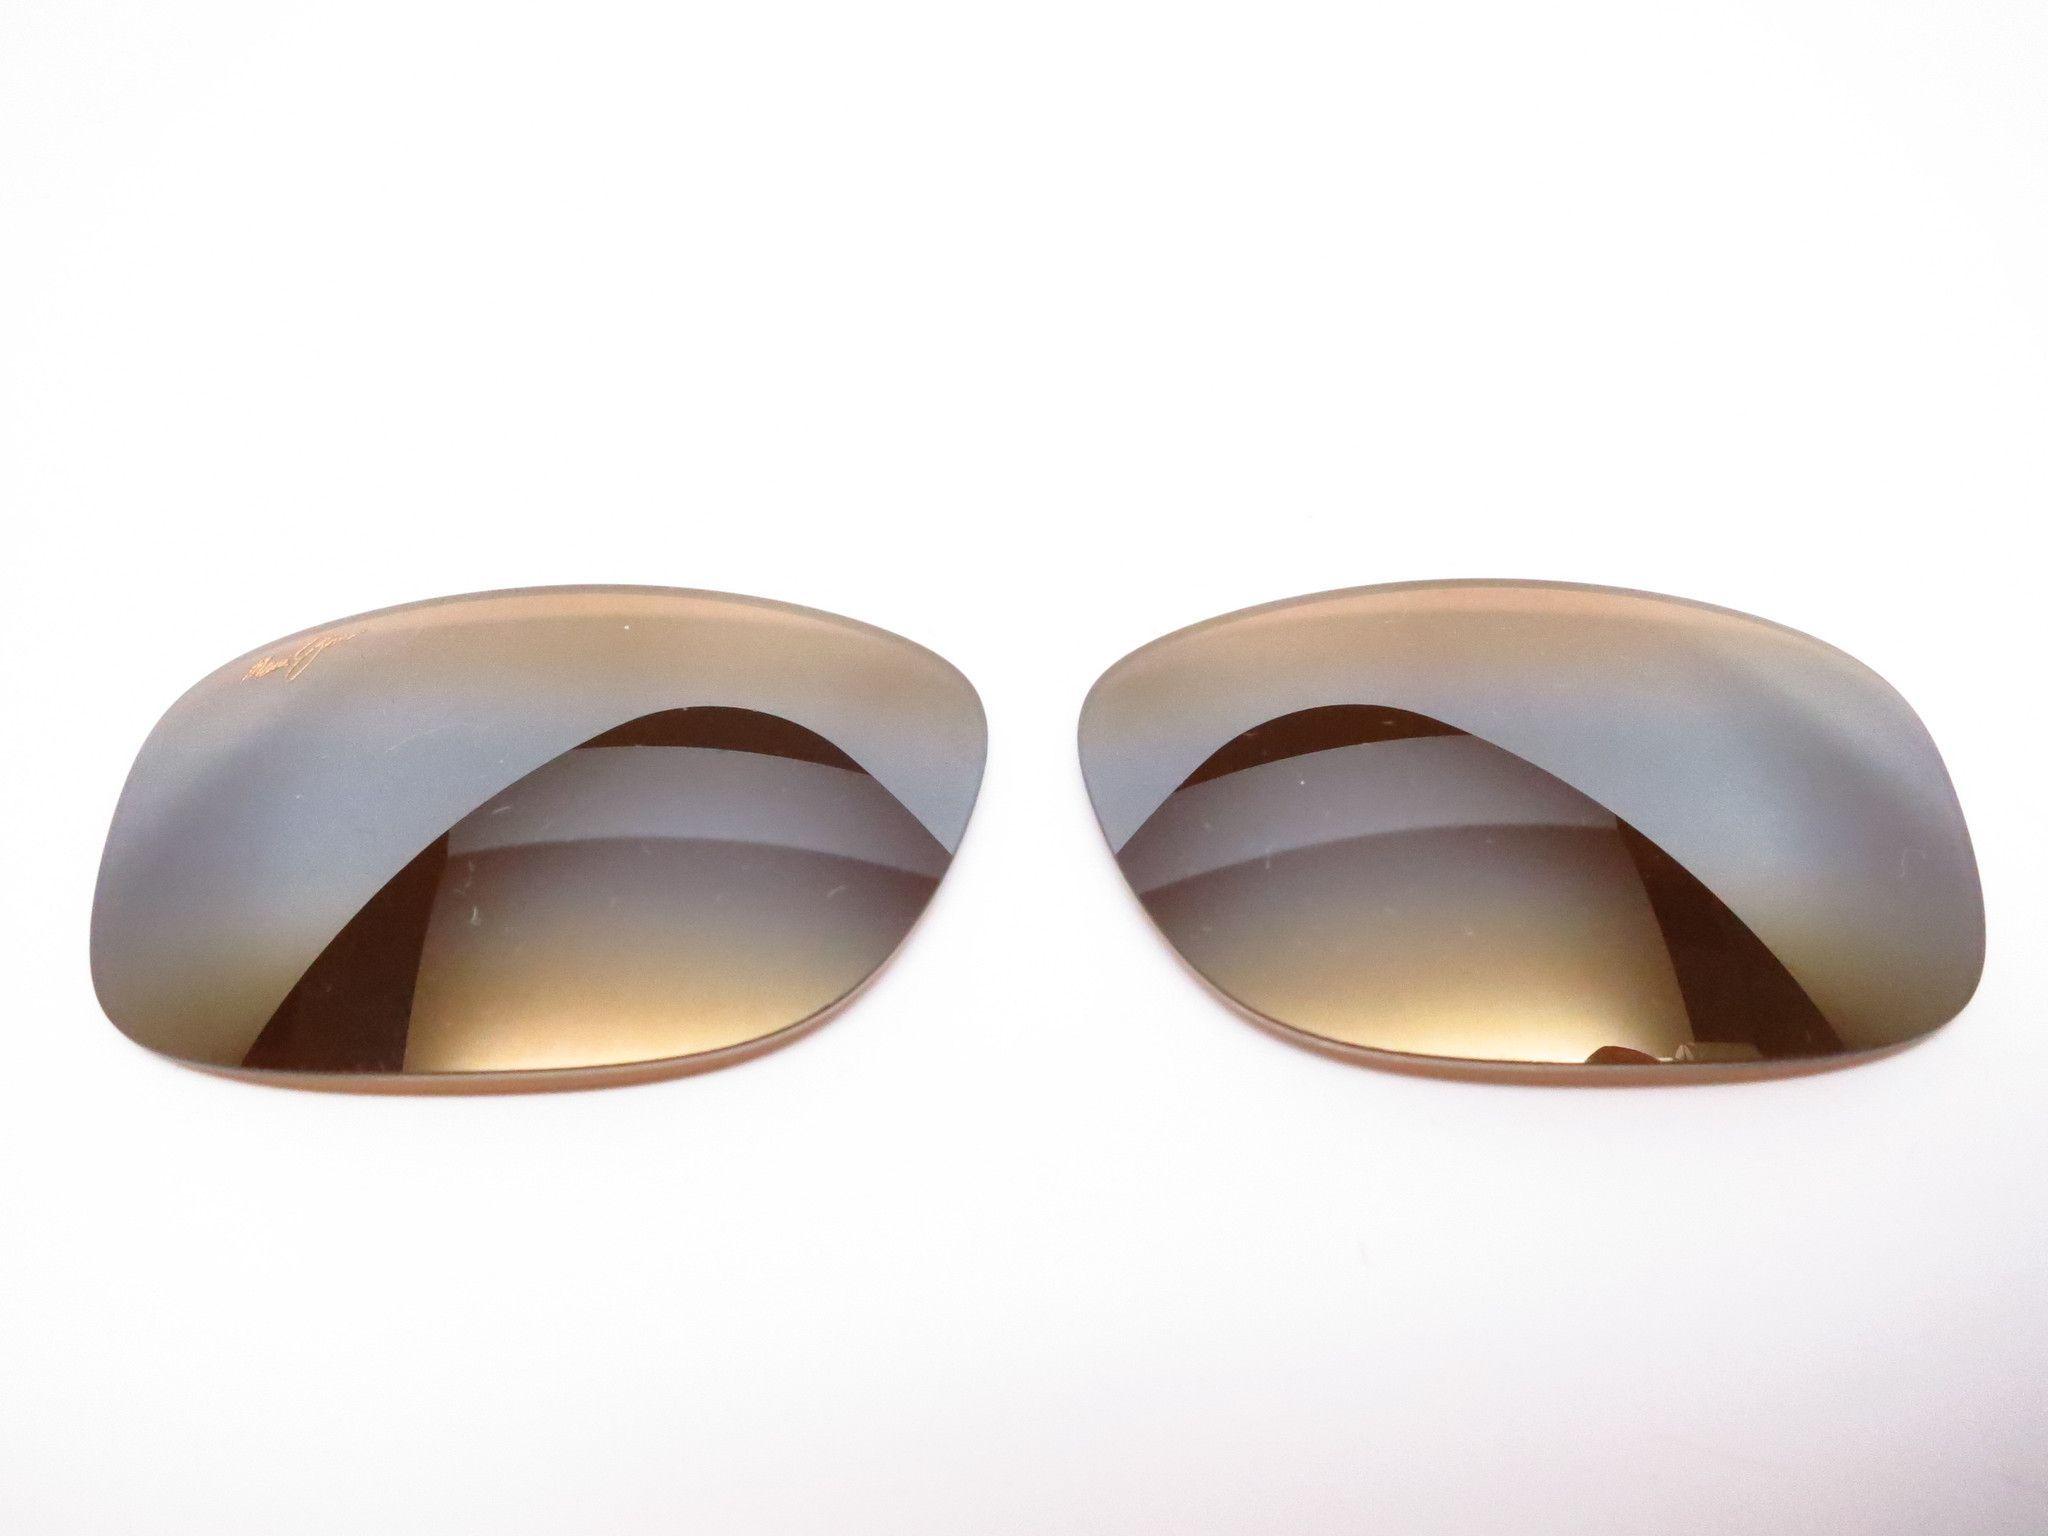 9ef8a305e1 Maui Jim Bamboo Forest MJ415 Sunglass Replacement Lenses